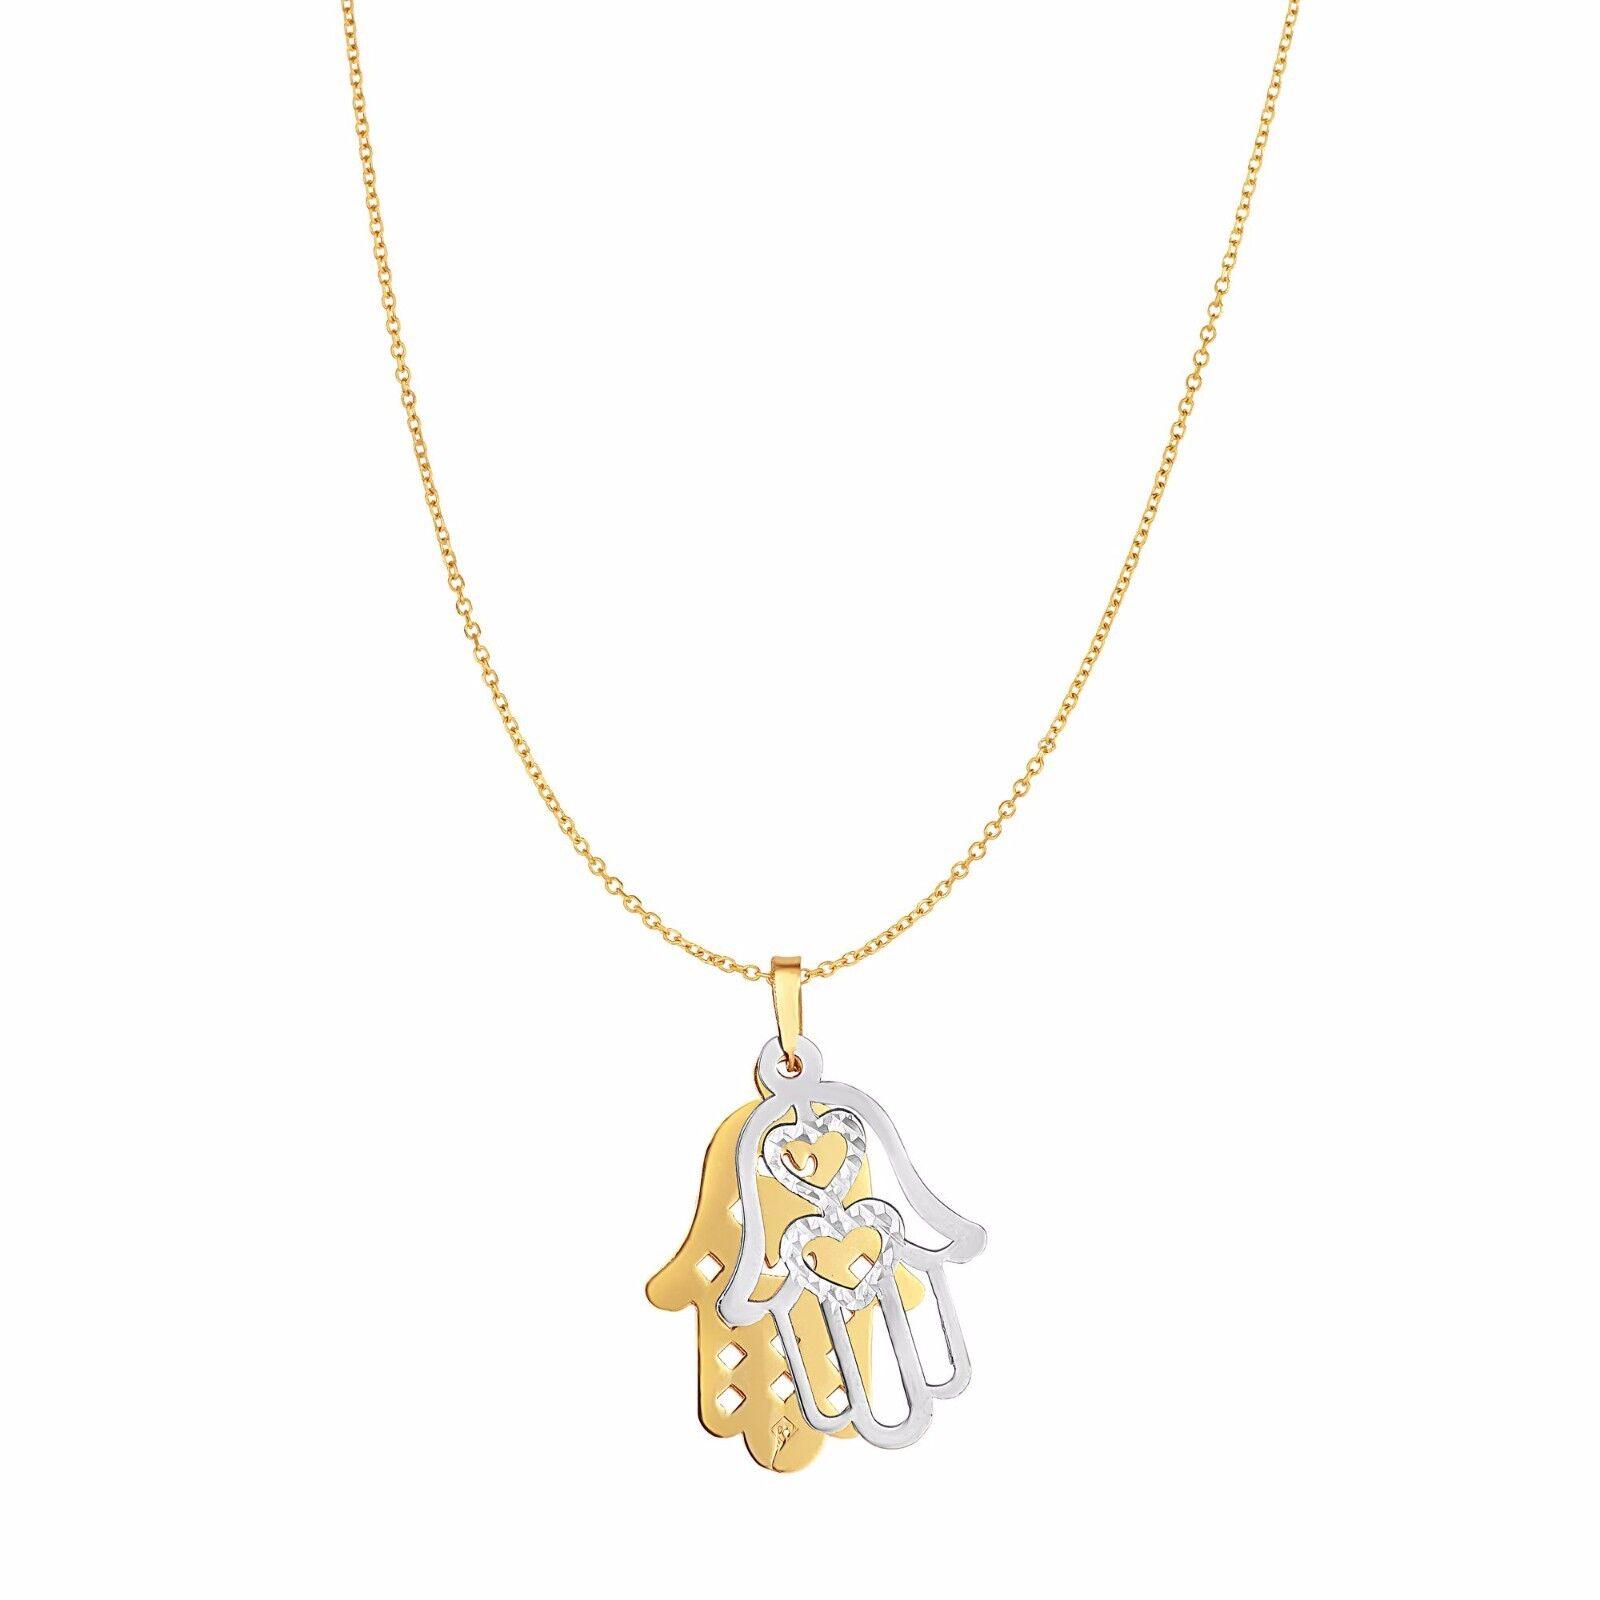 14k Solid Yellow Gold Textured Filigree Hamsa Hand of Fatima Pendant